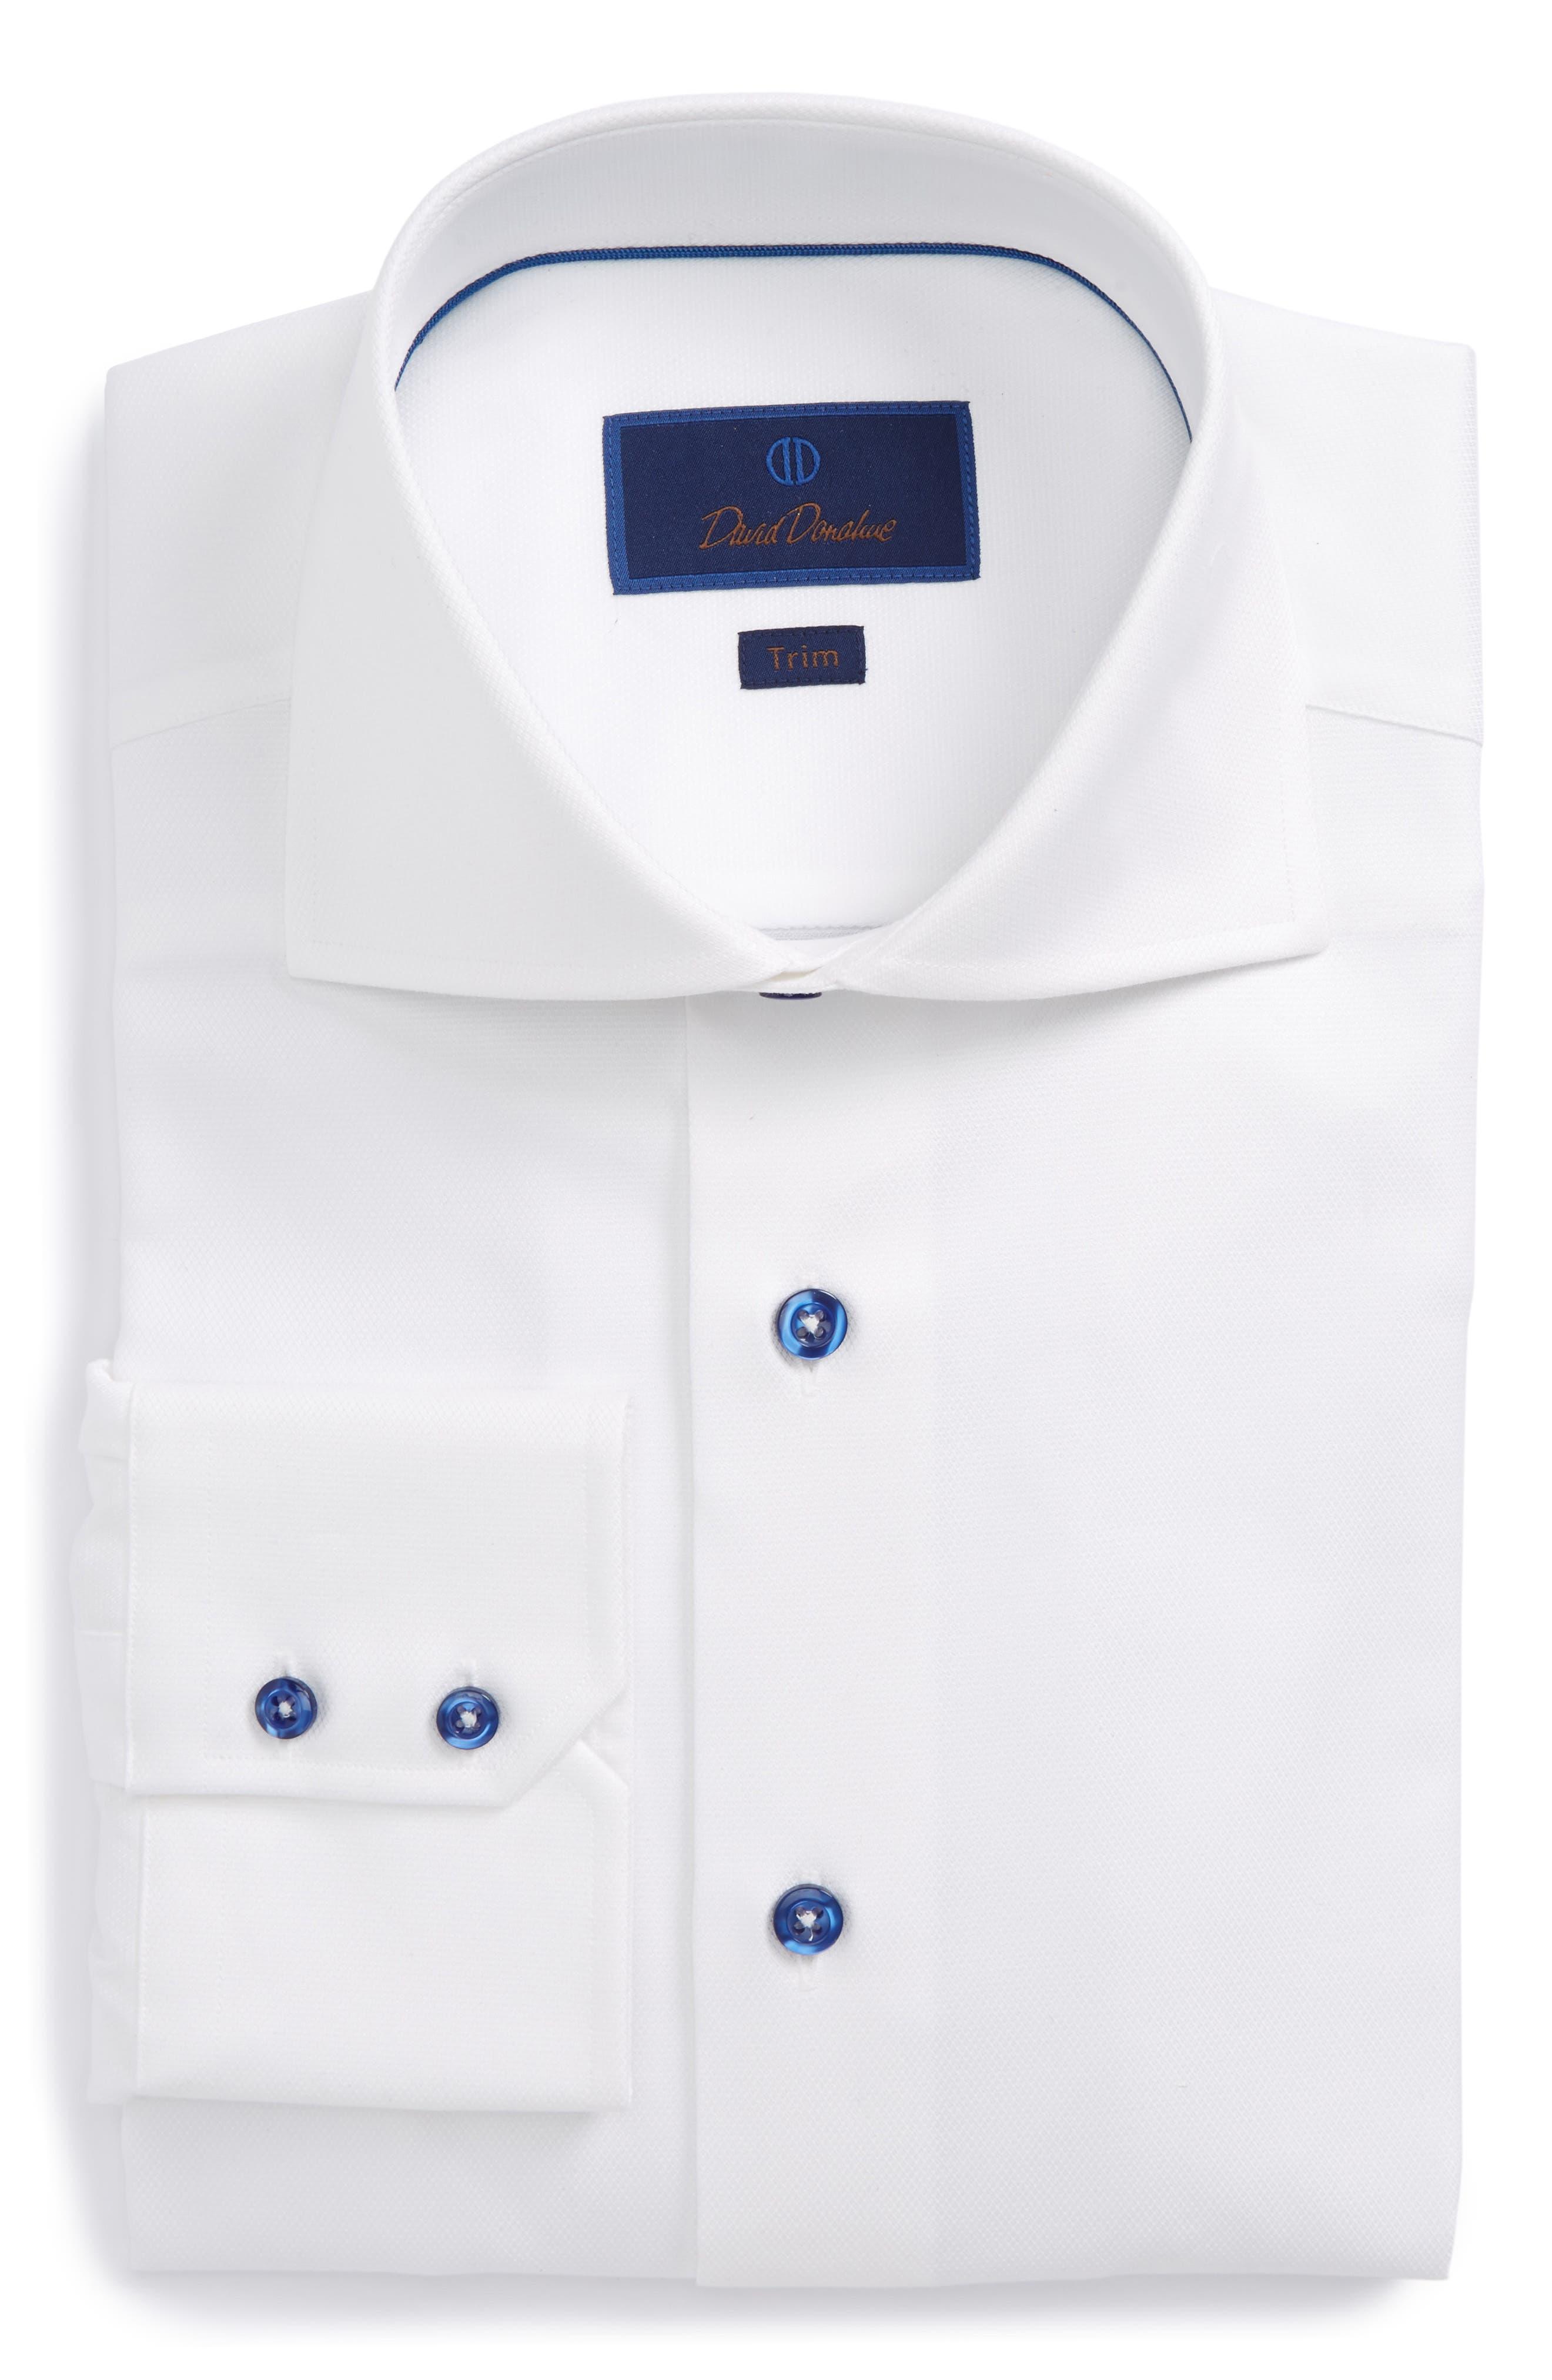 DAVID DONAHUE, Trim Fit Diamond Weave Dress Shirt, Main thumbnail 1, color, WHITE